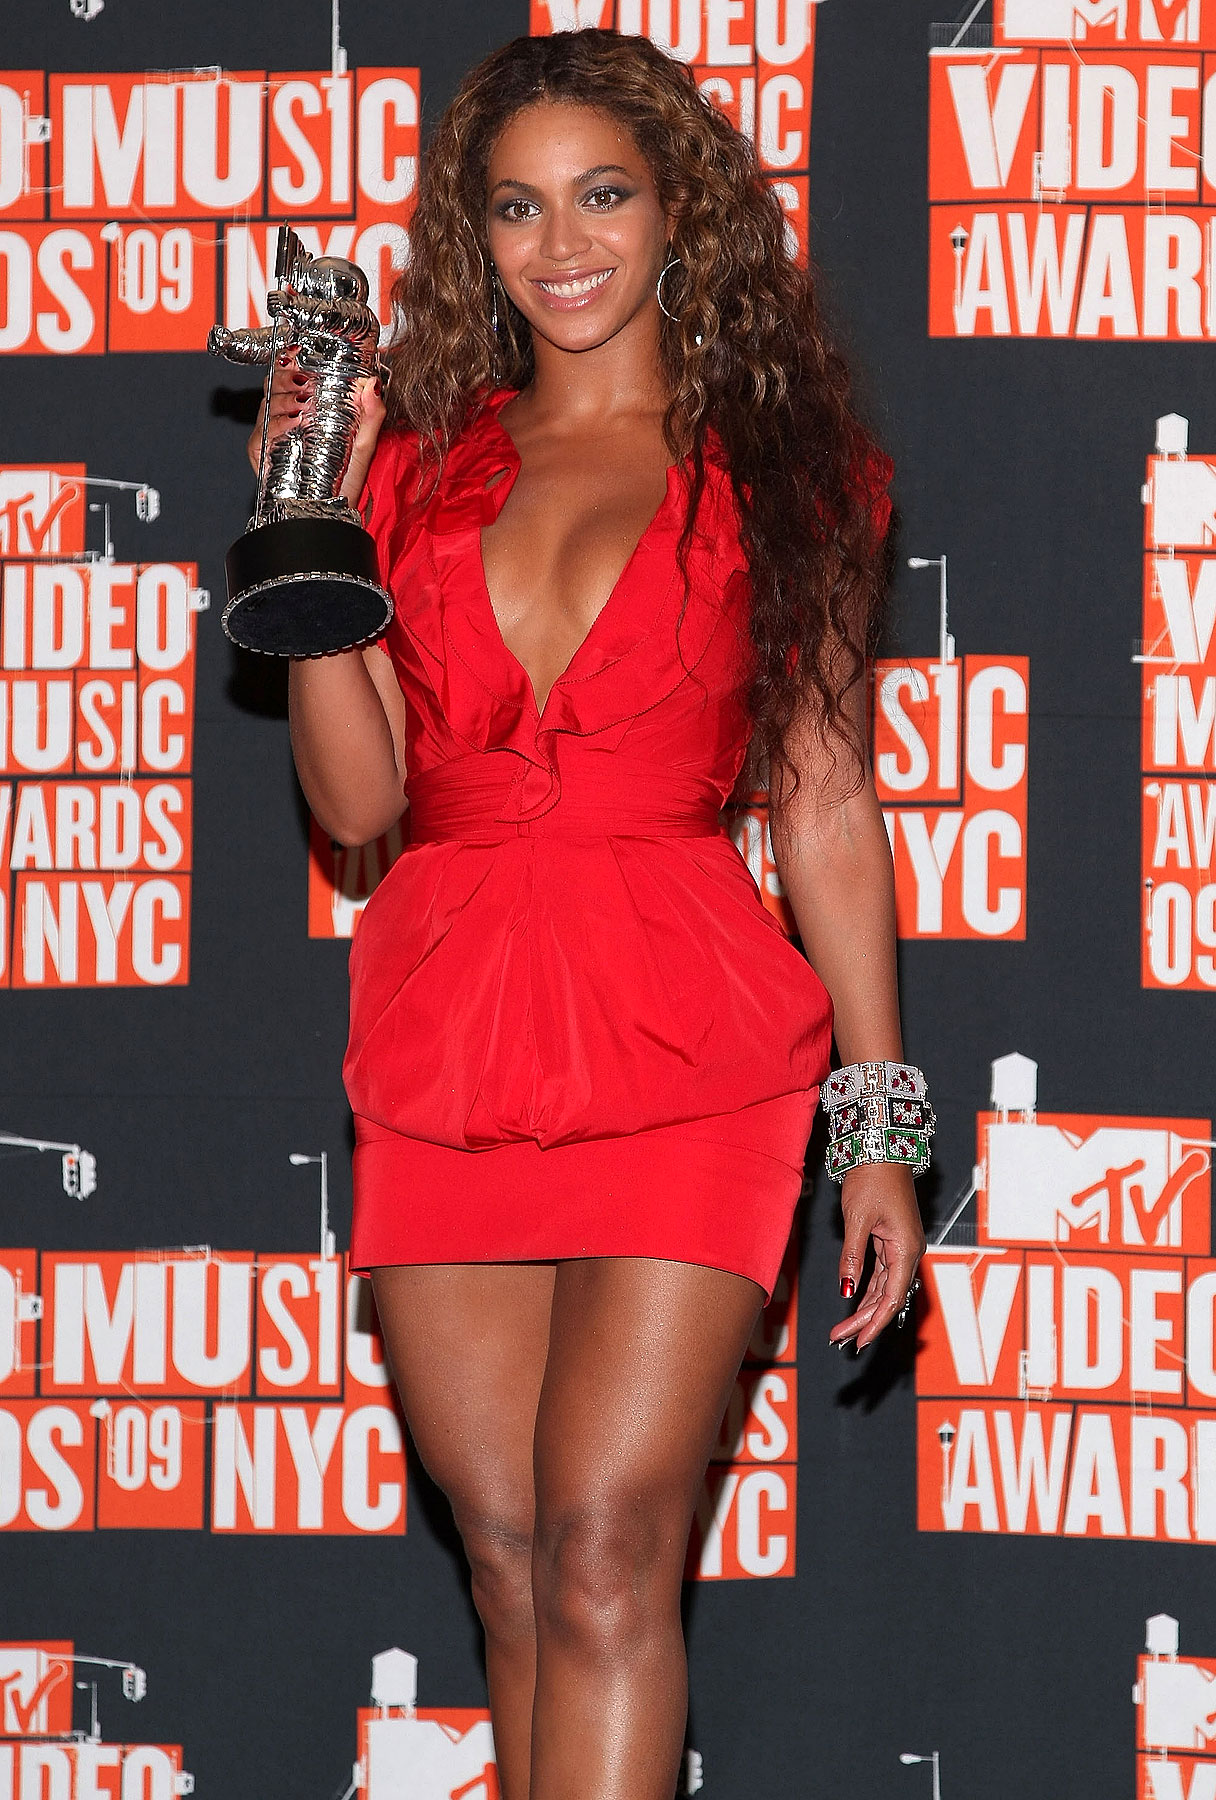 MTV Video Music Award Winners!